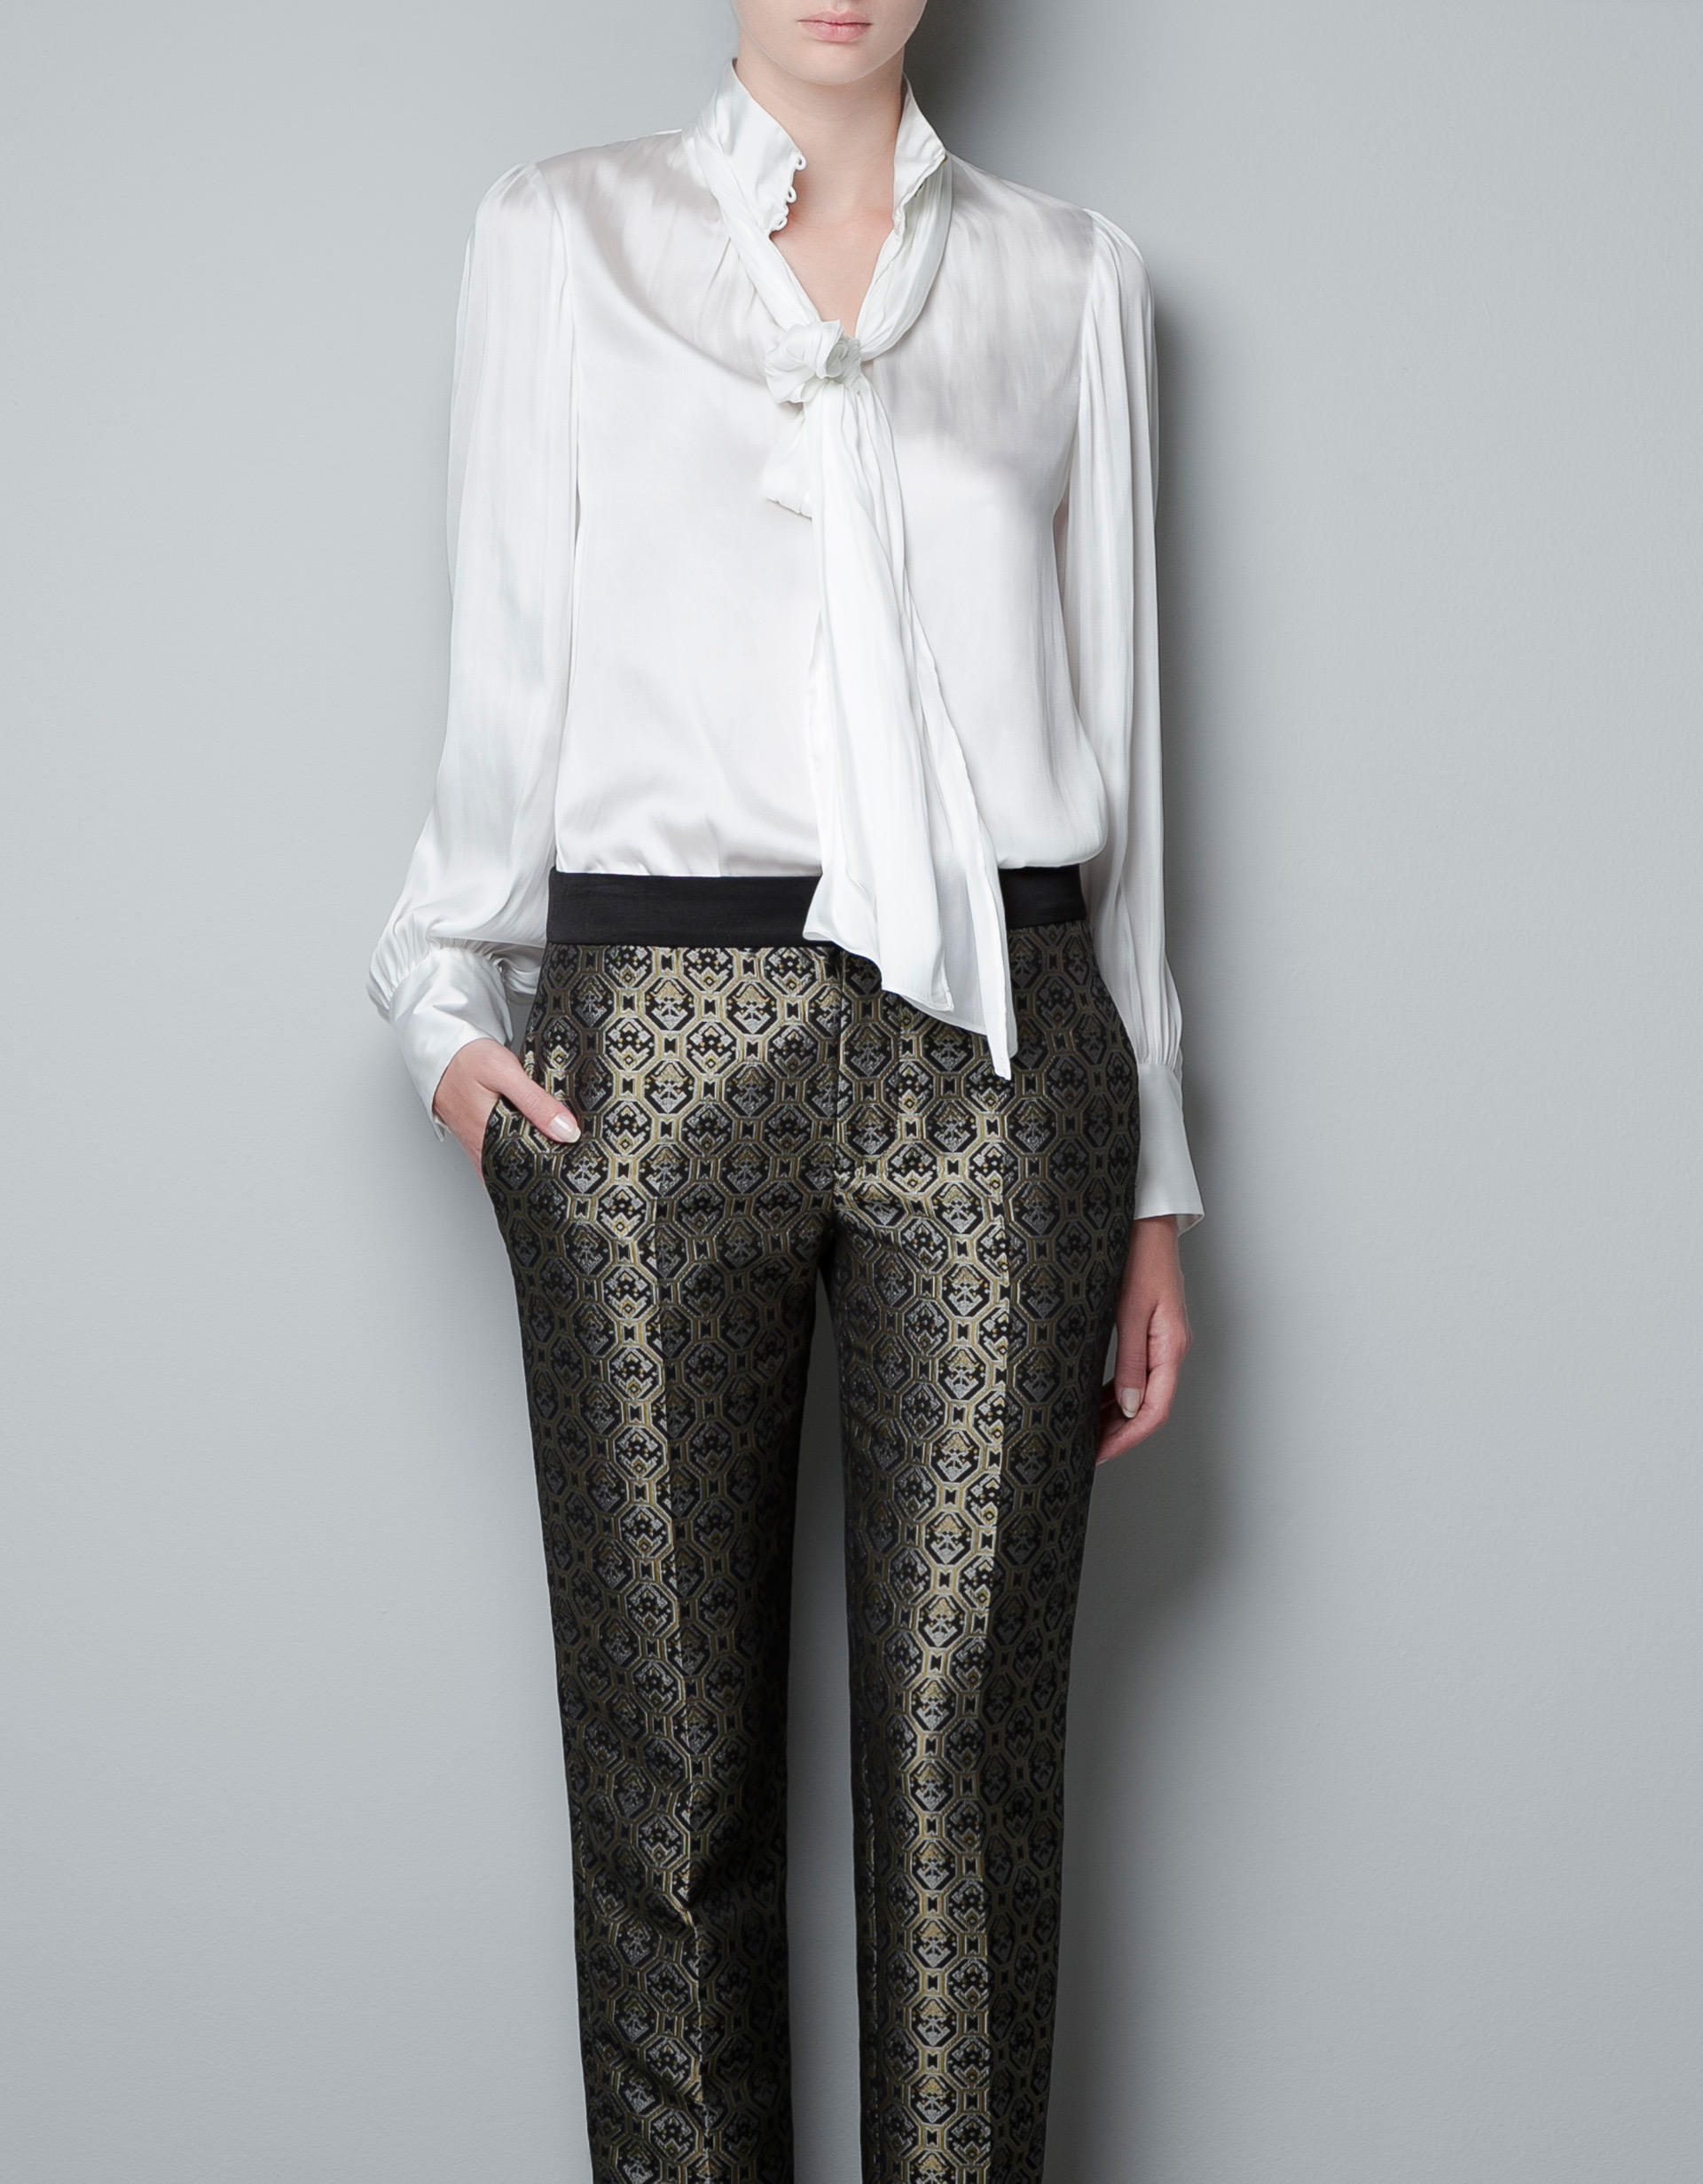 Zara Pintuck Blouse 18